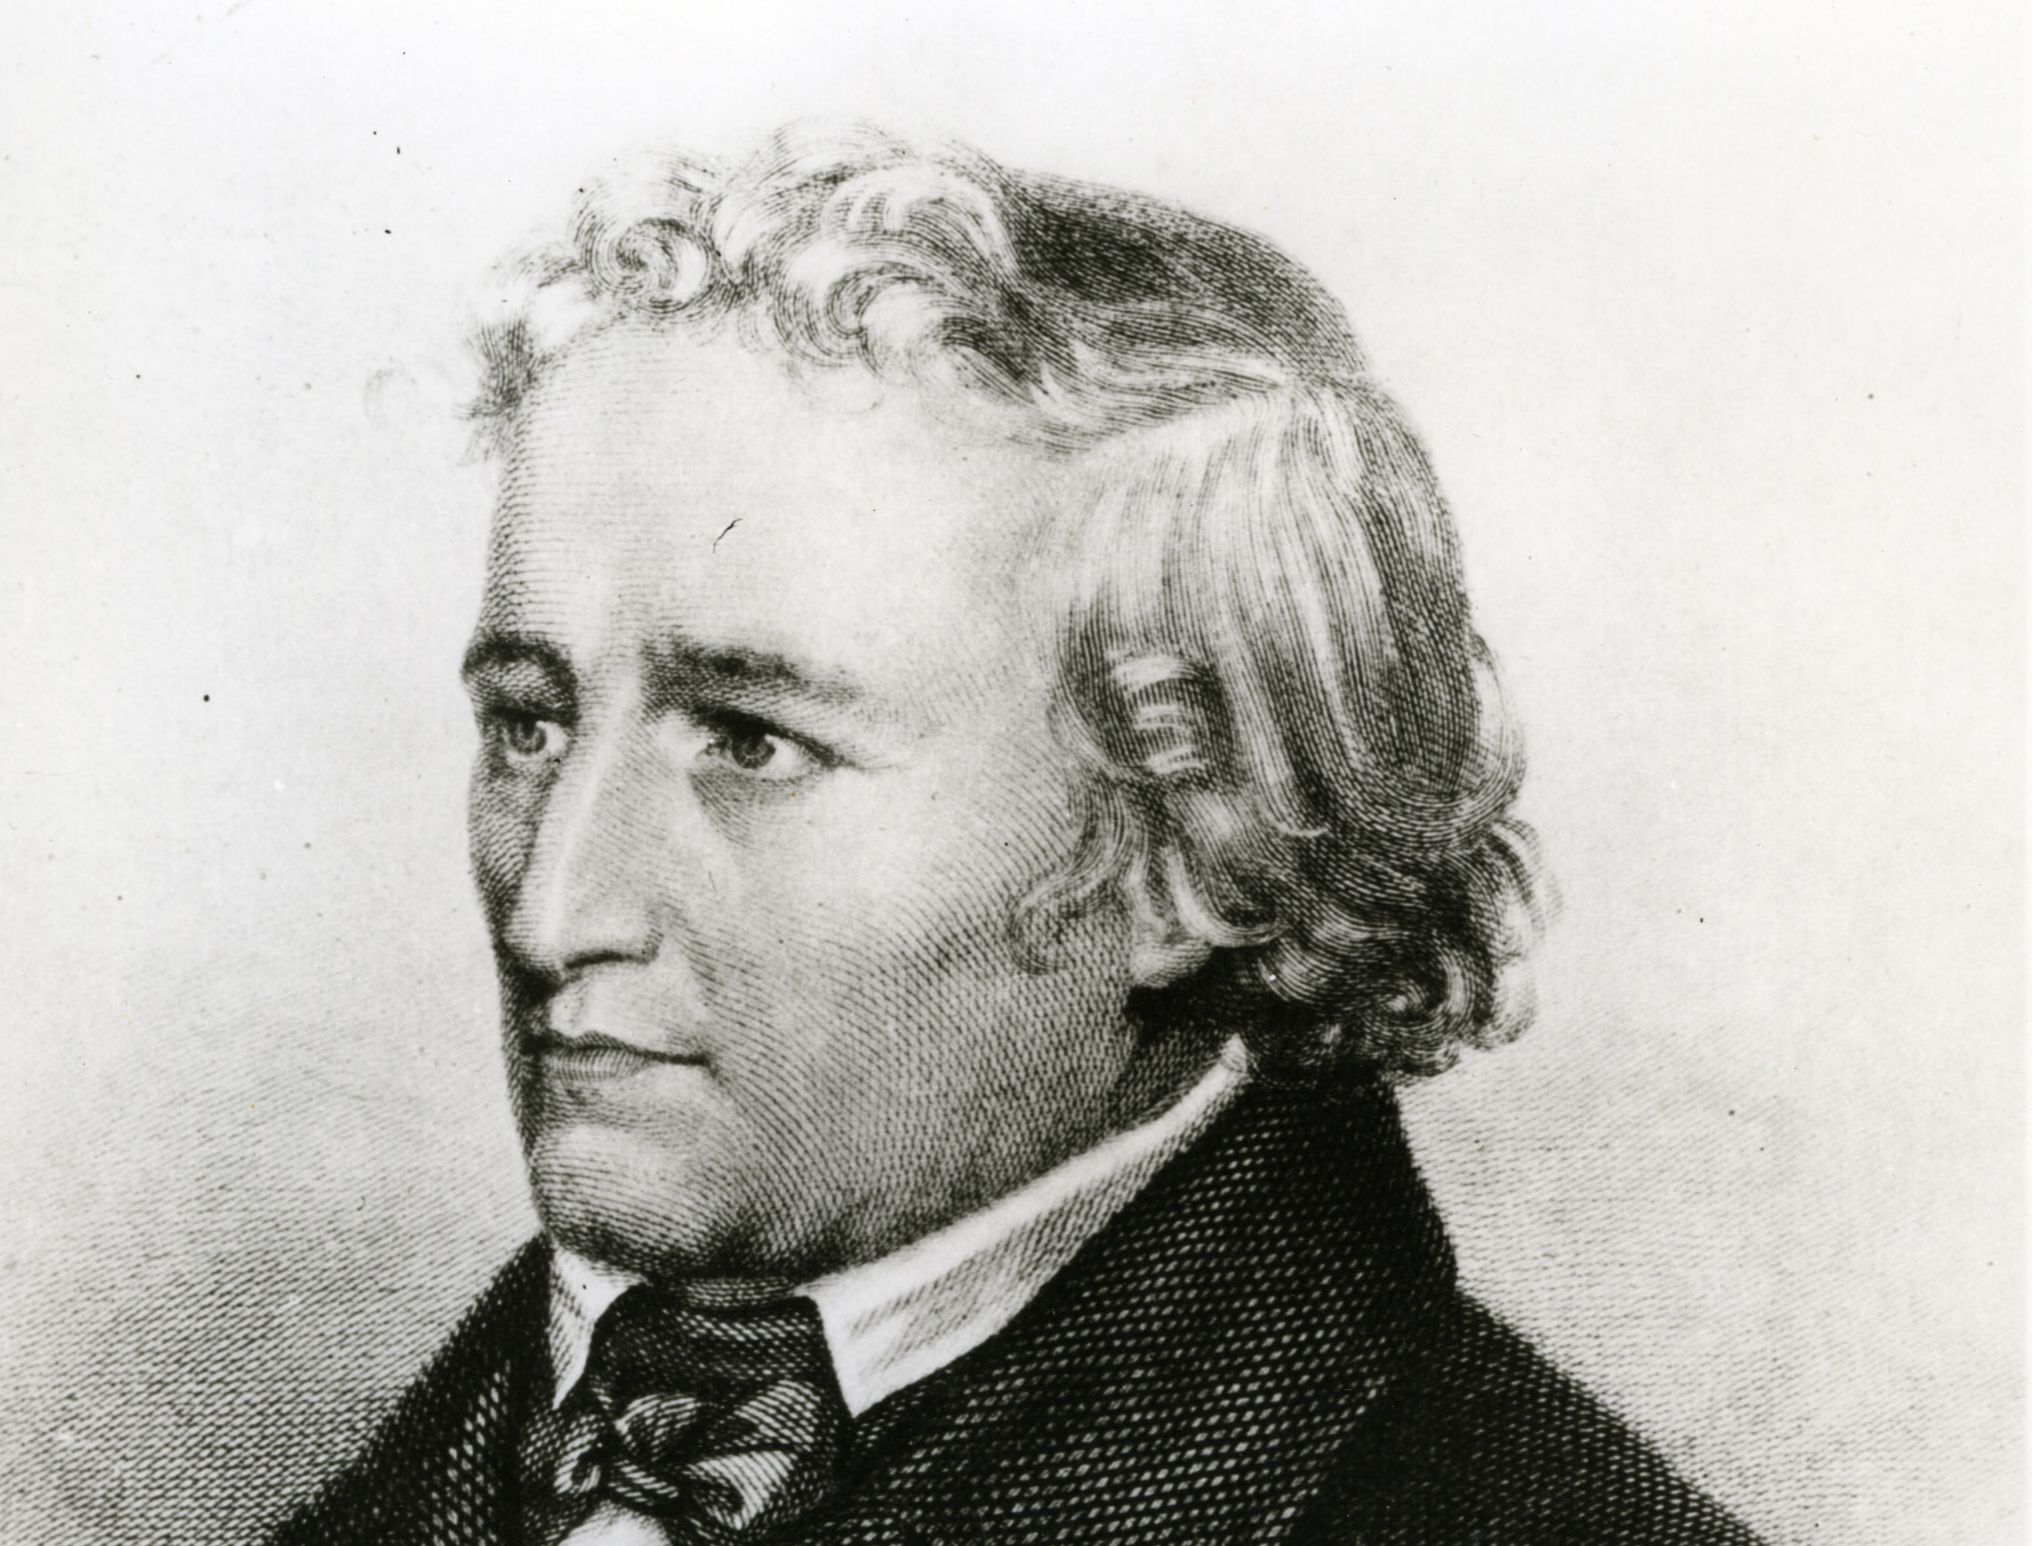 Jacob Grimm LeMO Biografie Biografie Jacob Grimm